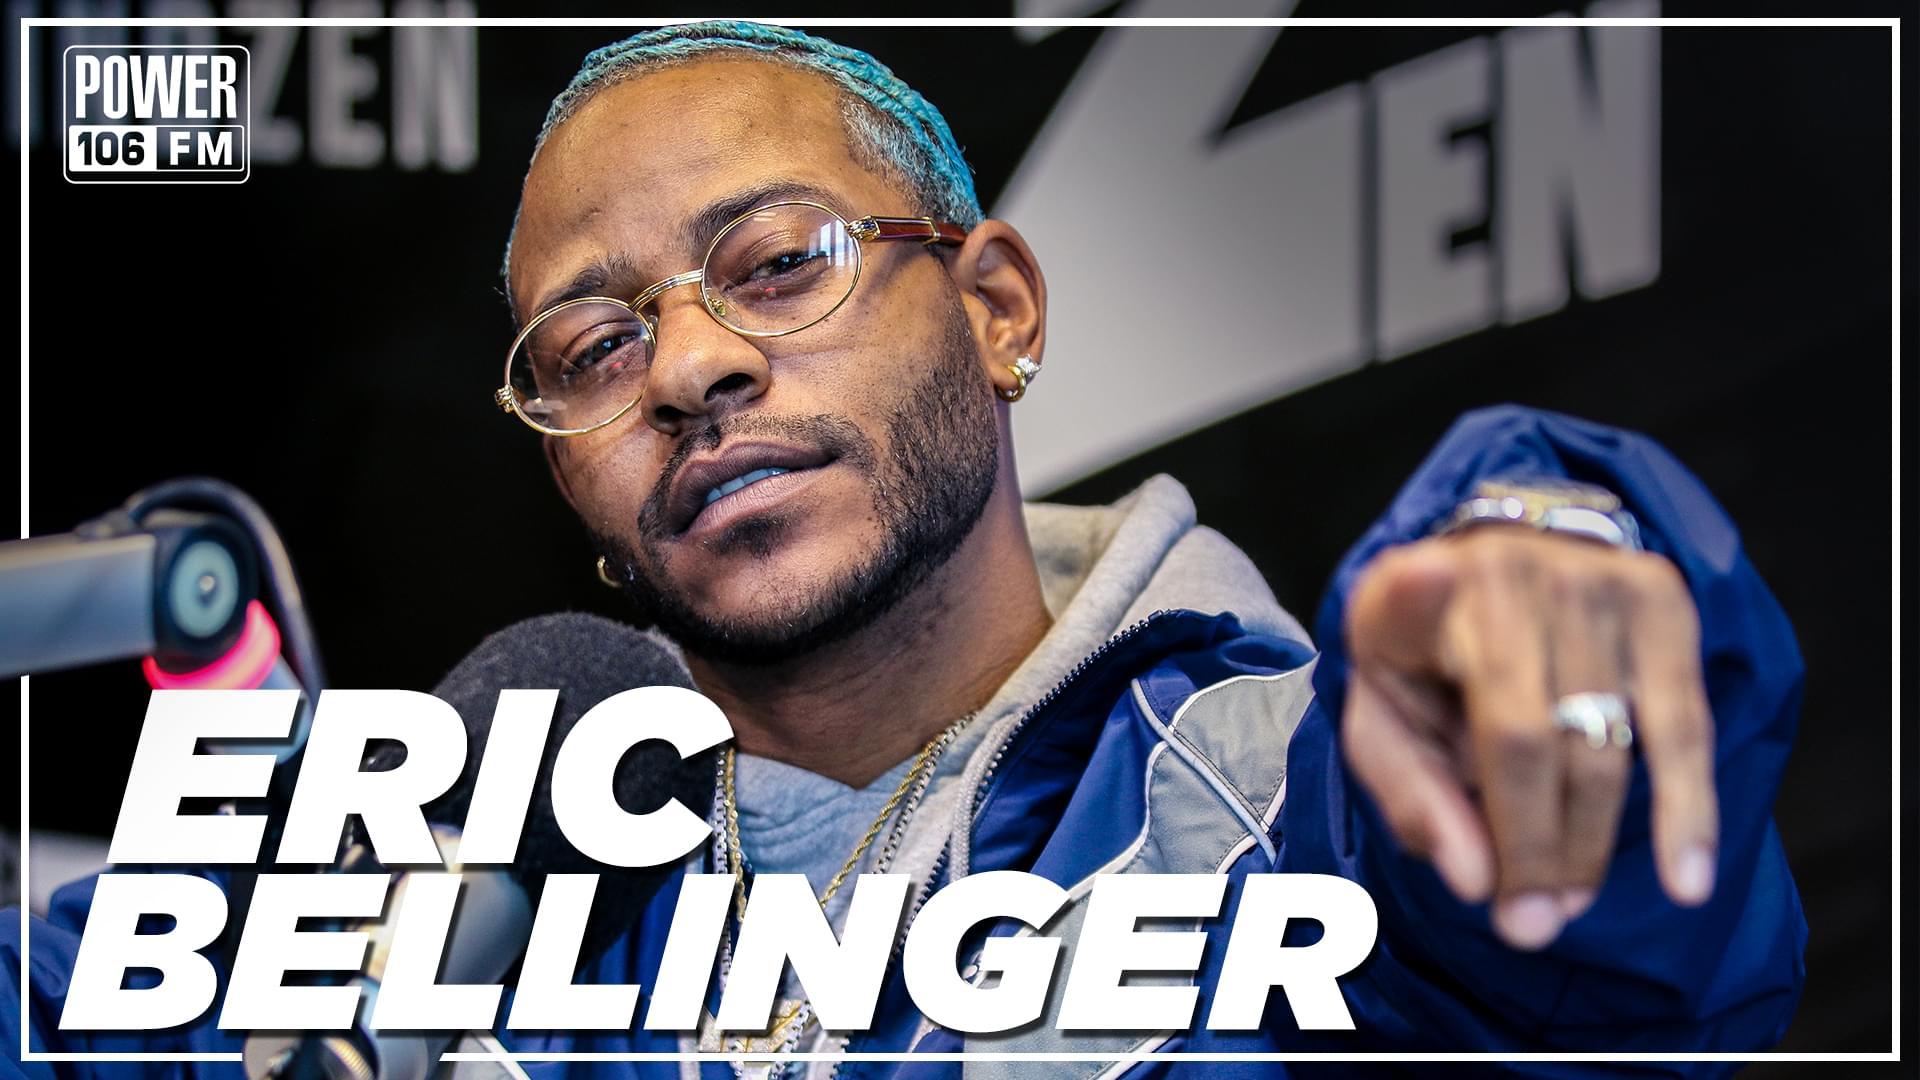 Eric Bellinger On 'The Rebirth 2', Views On R. Kelly & Michael Jackson + Friendship w/ Chris Brown